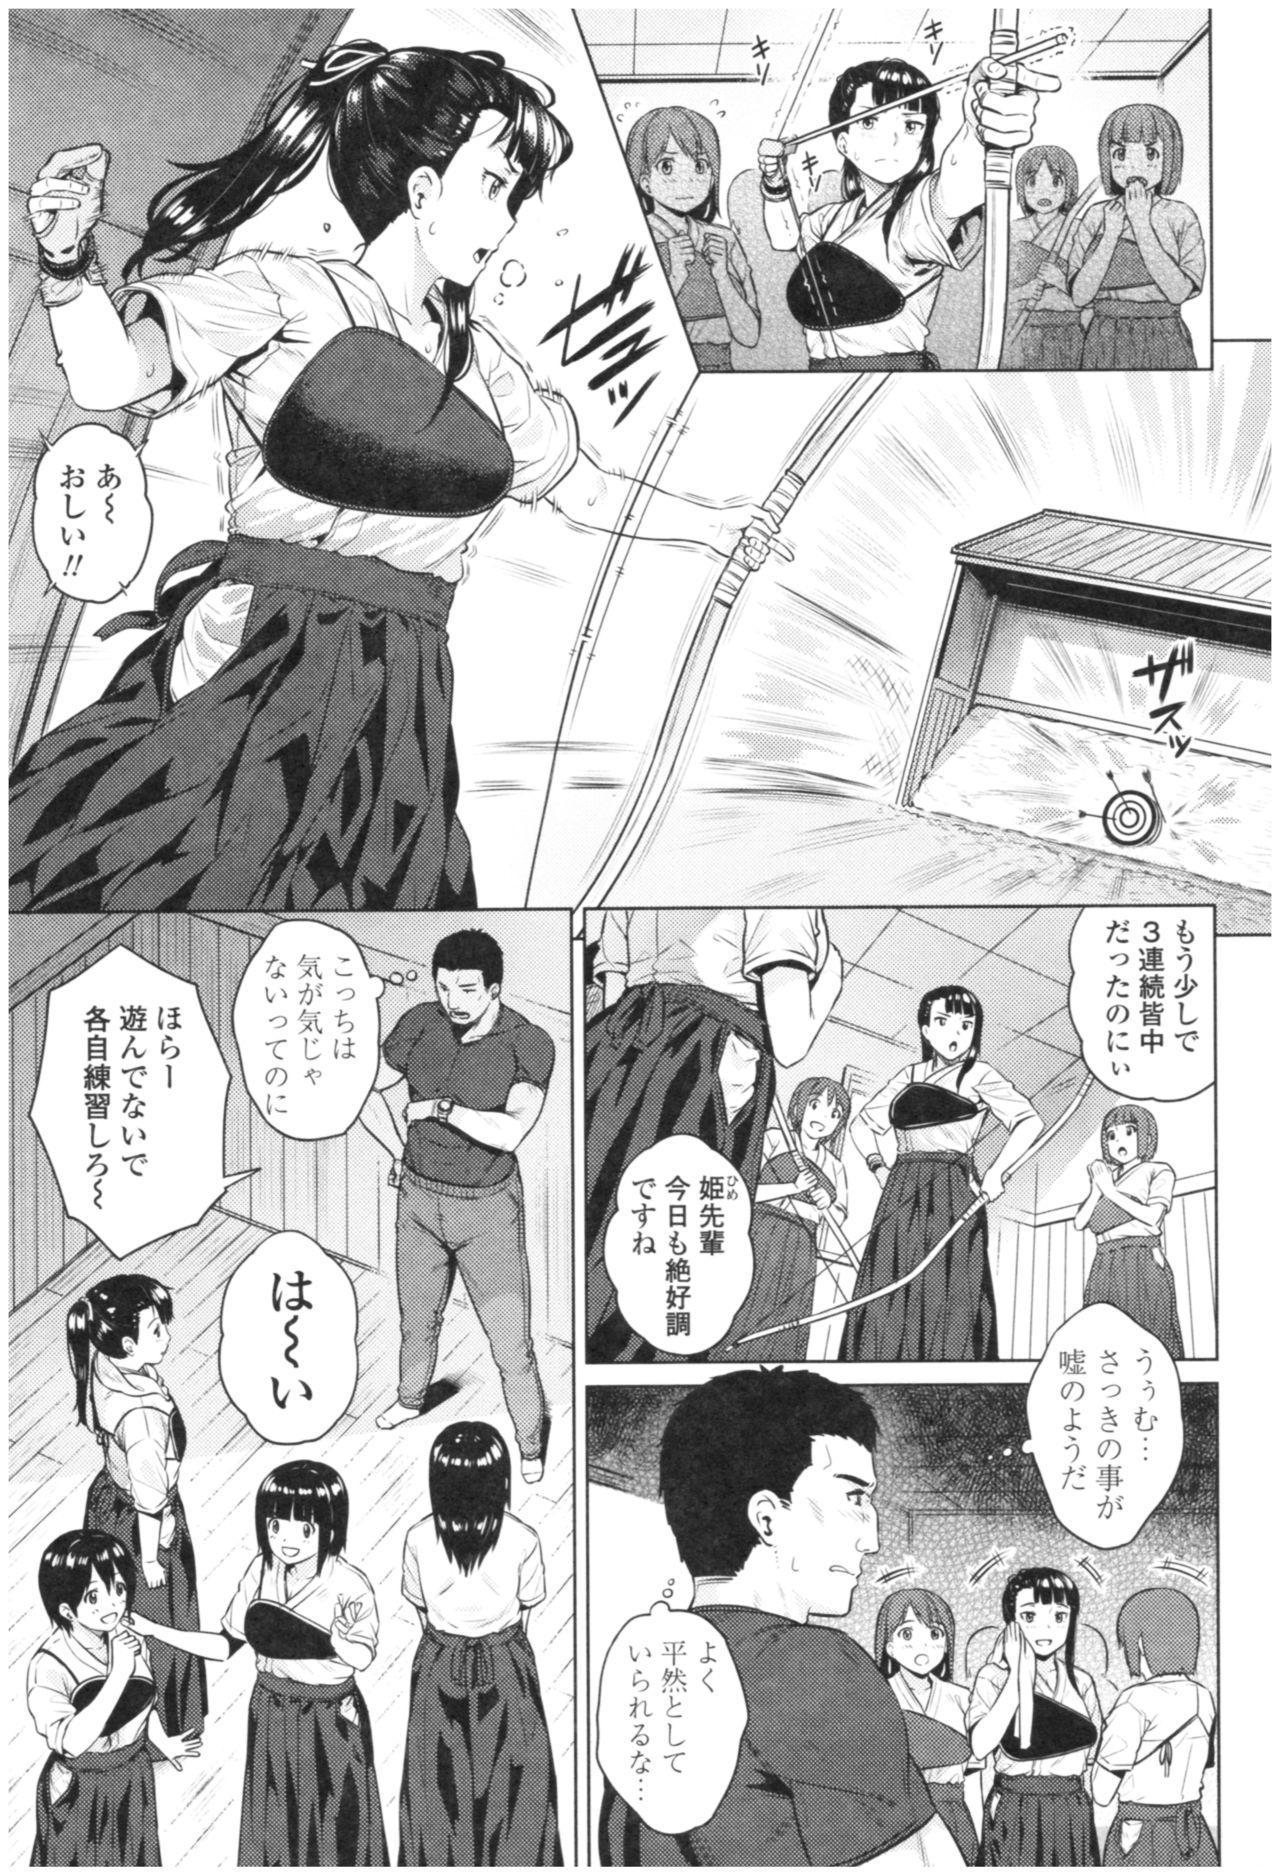 Bitch Kanojo no Hatsukoi Jouji - Her Lewd First Love and SEX 54